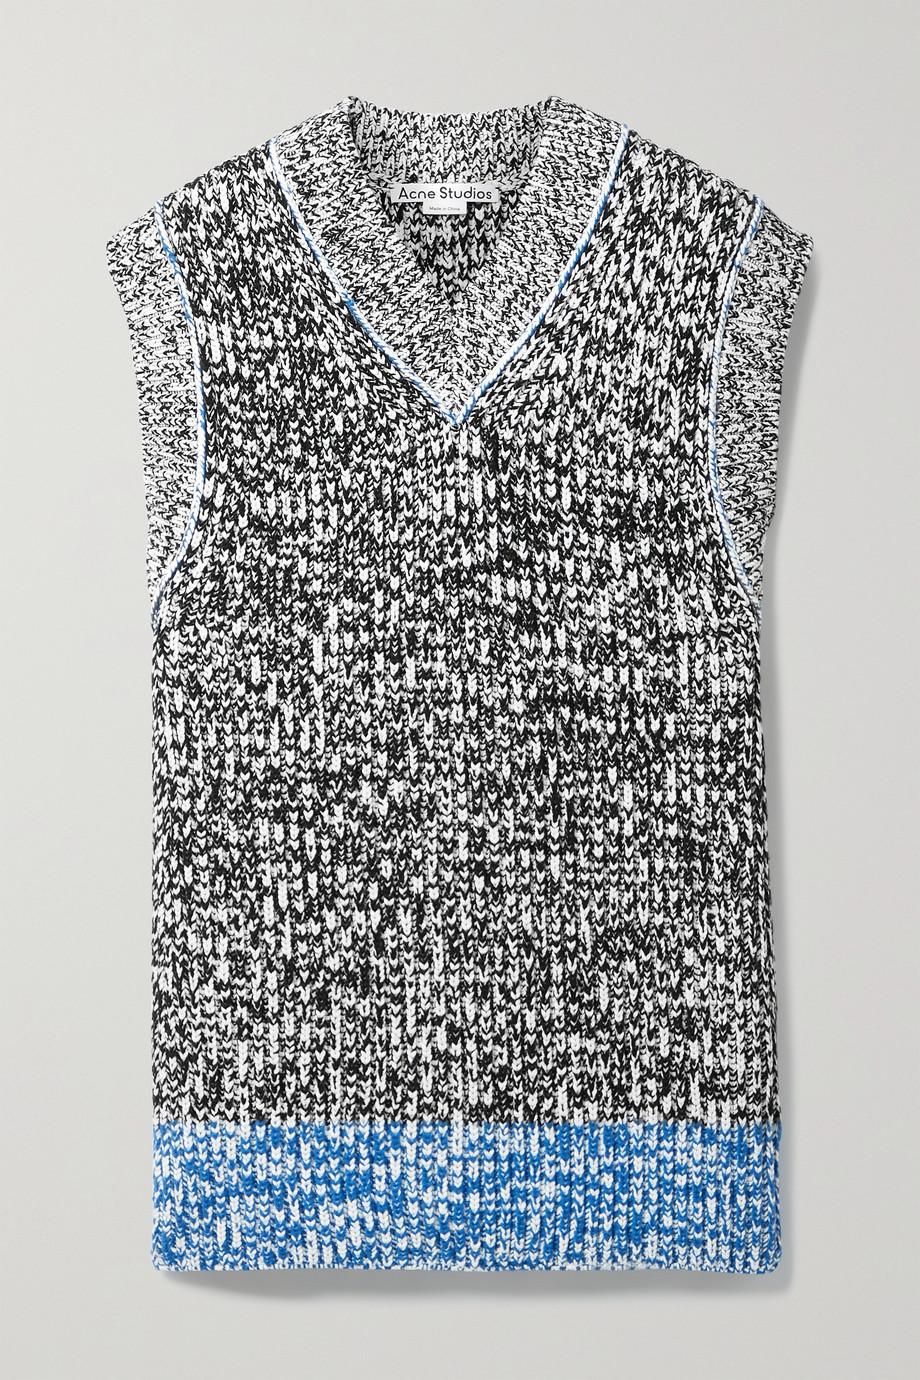 Acne Studios Ärmelloser Oversized-Pullover aus Strick